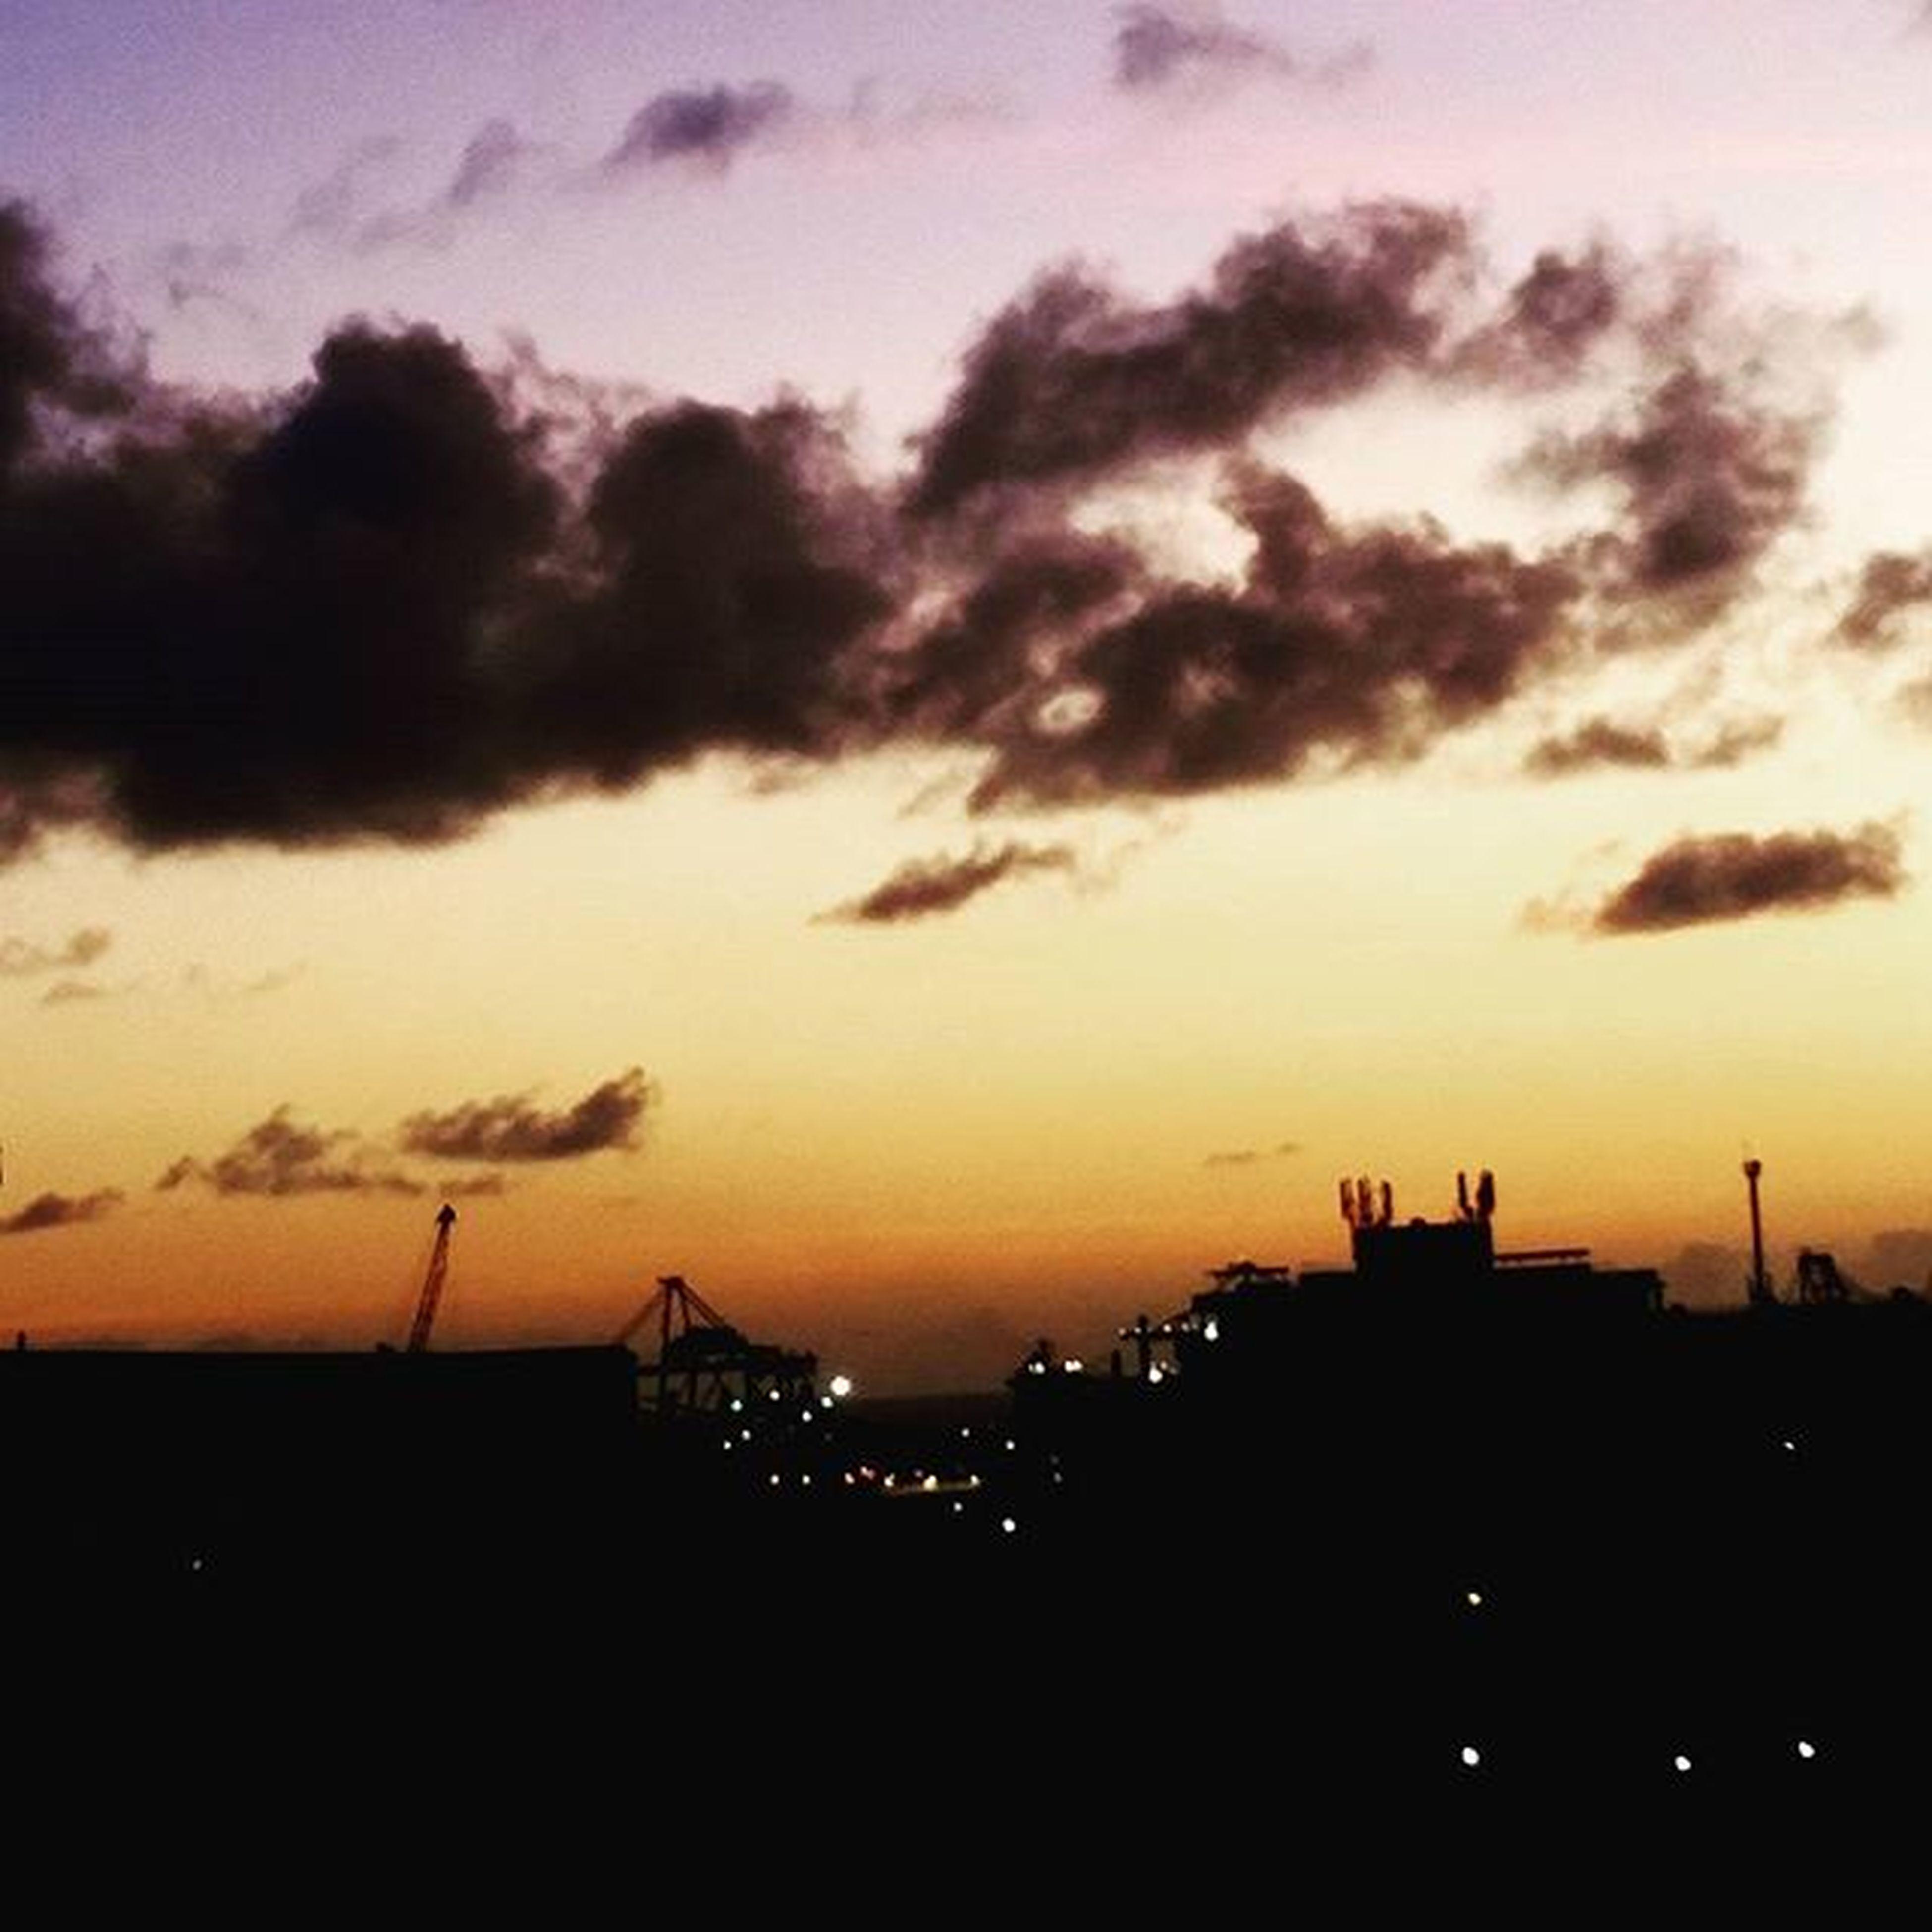 sunset, silhouette, building exterior, architecture, built structure, sky, orange color, cloud - sky, industry, crane - construction machinery, city, development, construction site, dramatic sky, crane, dusk, dark, cloud, outdoors, building